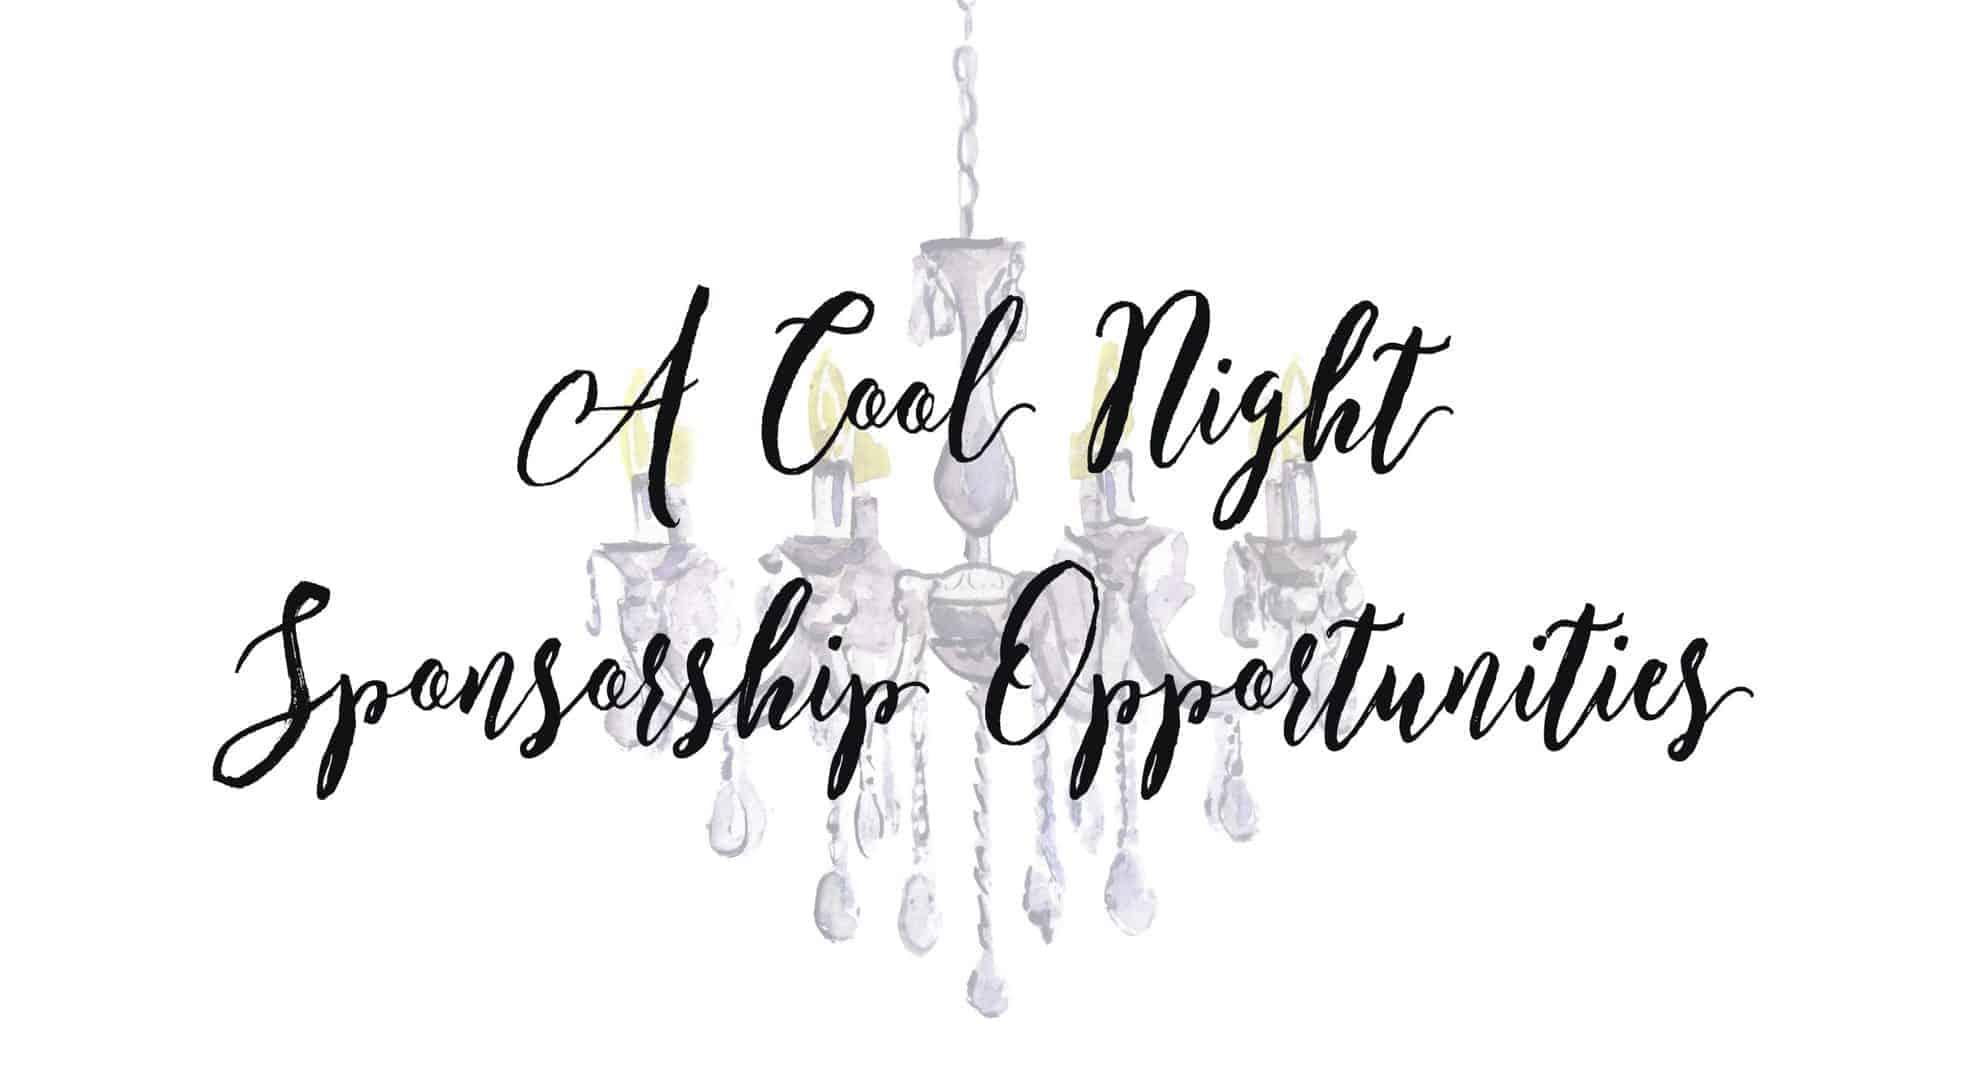 a cool night sponsor opps